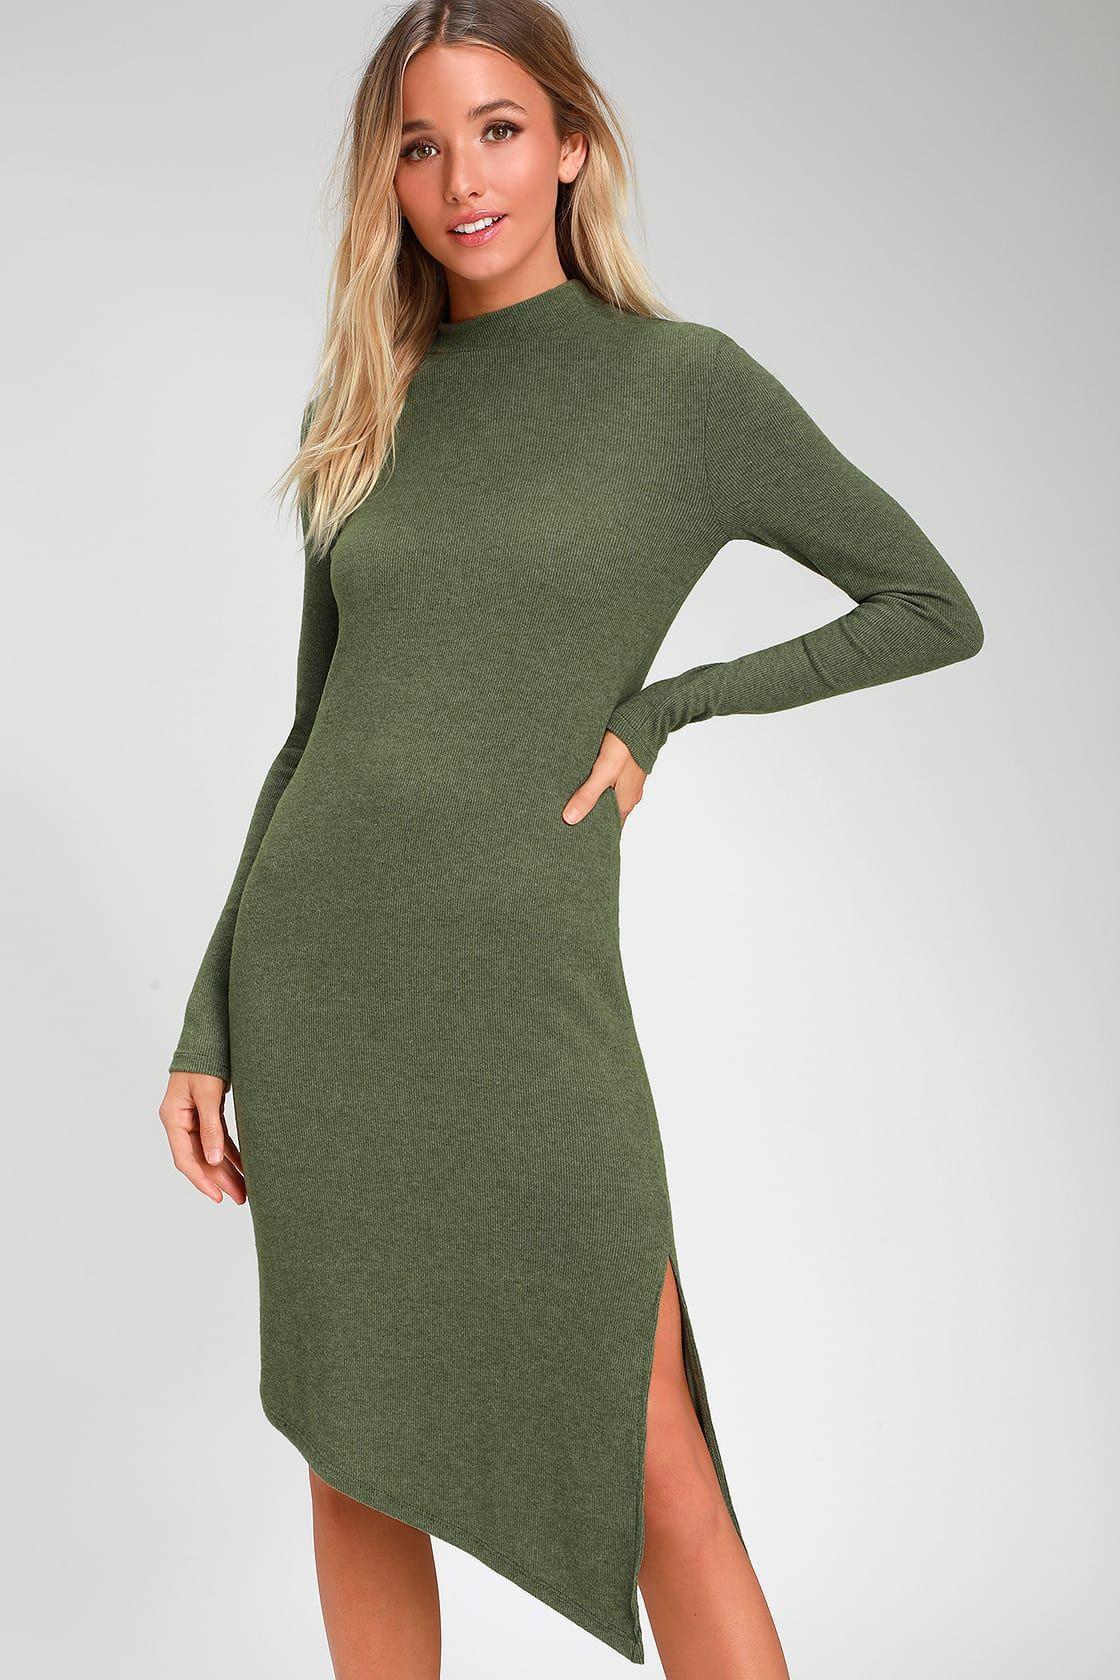 Fernley Olive Green Ribbed Long Sleeve Midi Dress Long Sleeve Midi Dress Short Green Dress Long Green Dress [ 1680 x 1120 Pixel ]